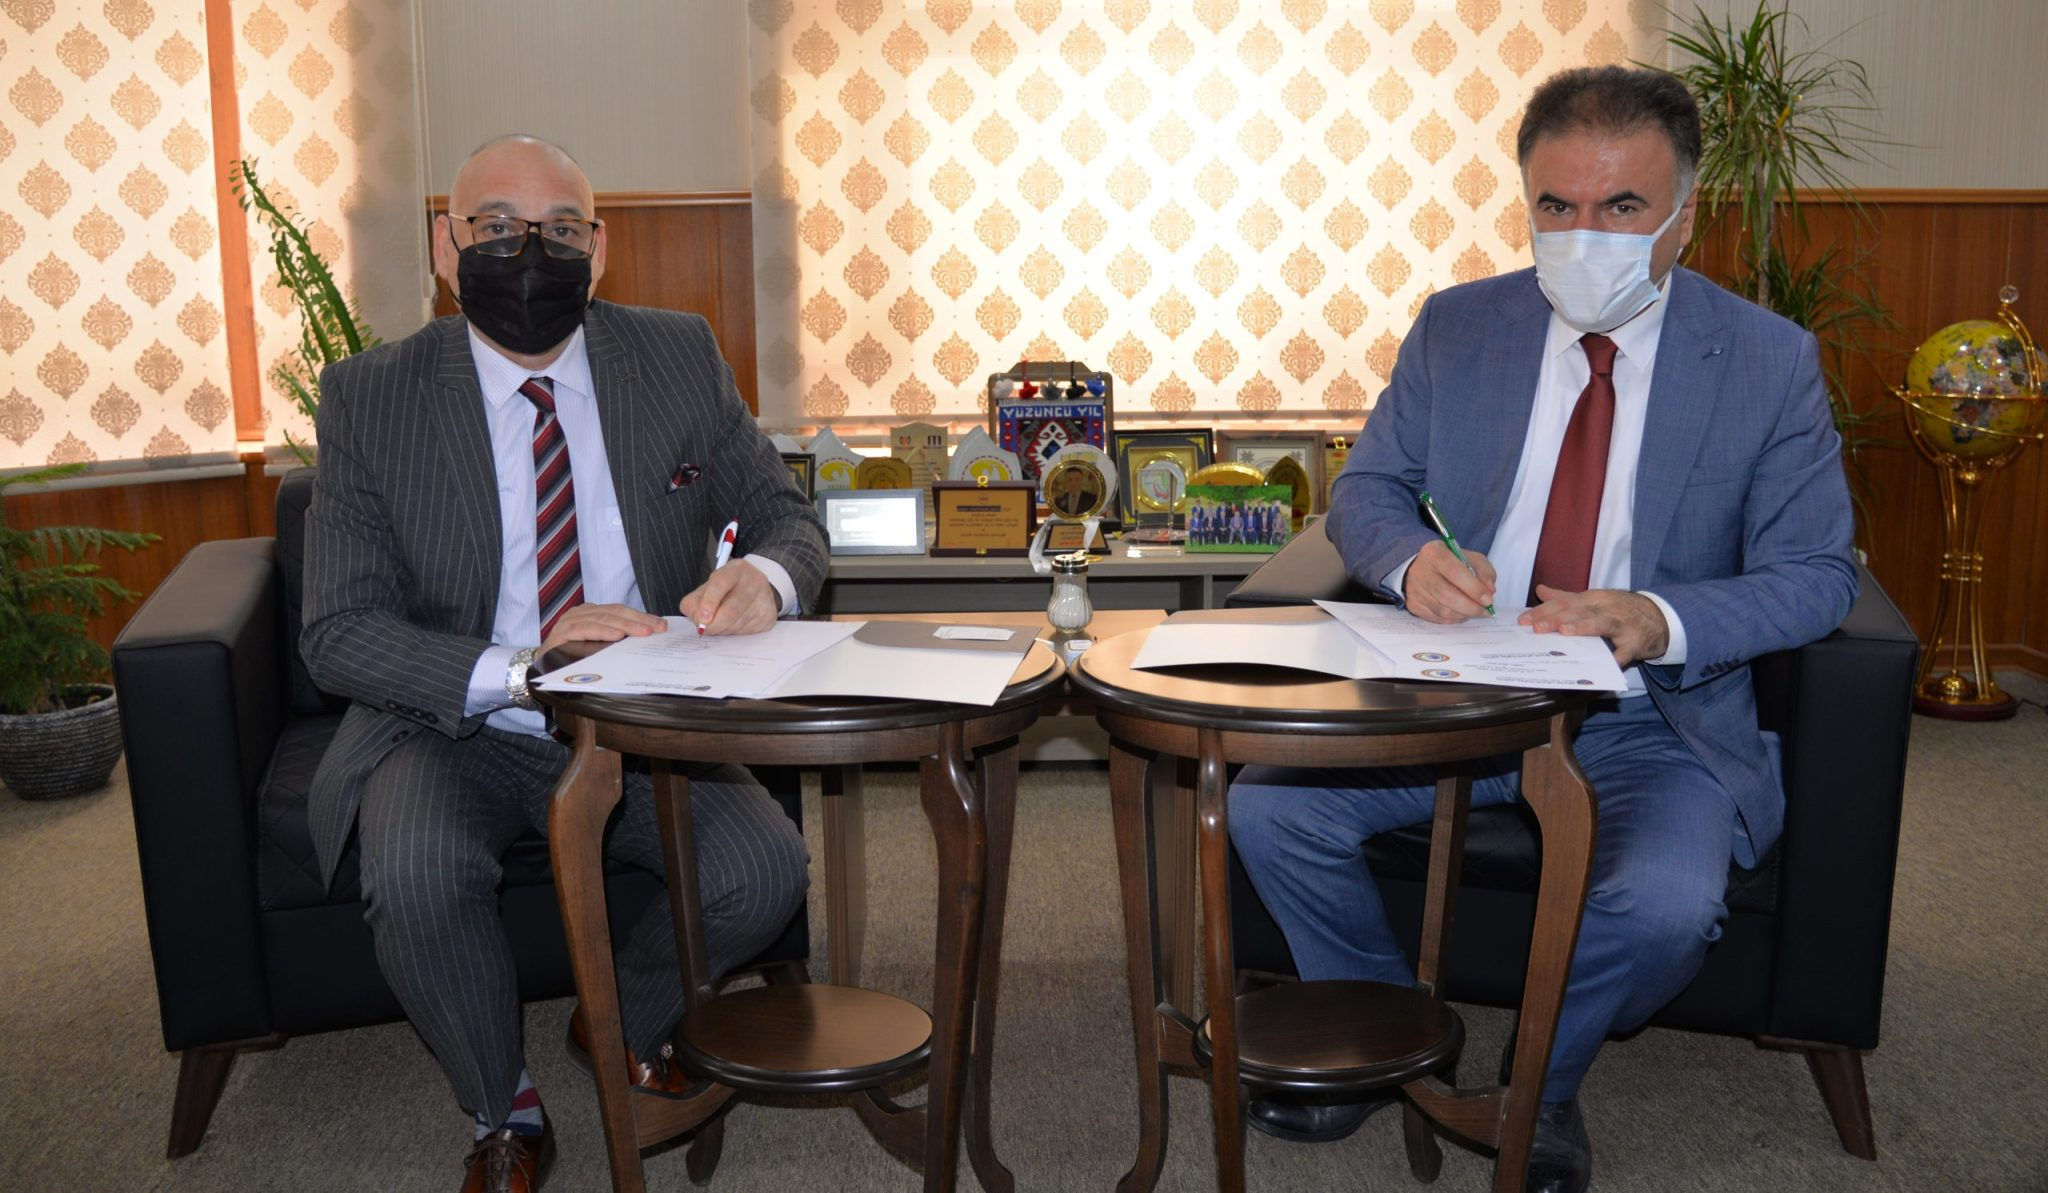 Erbil Polytechnic University And Arab Union For Development And Environment Signed A Memorandum Of Understanding